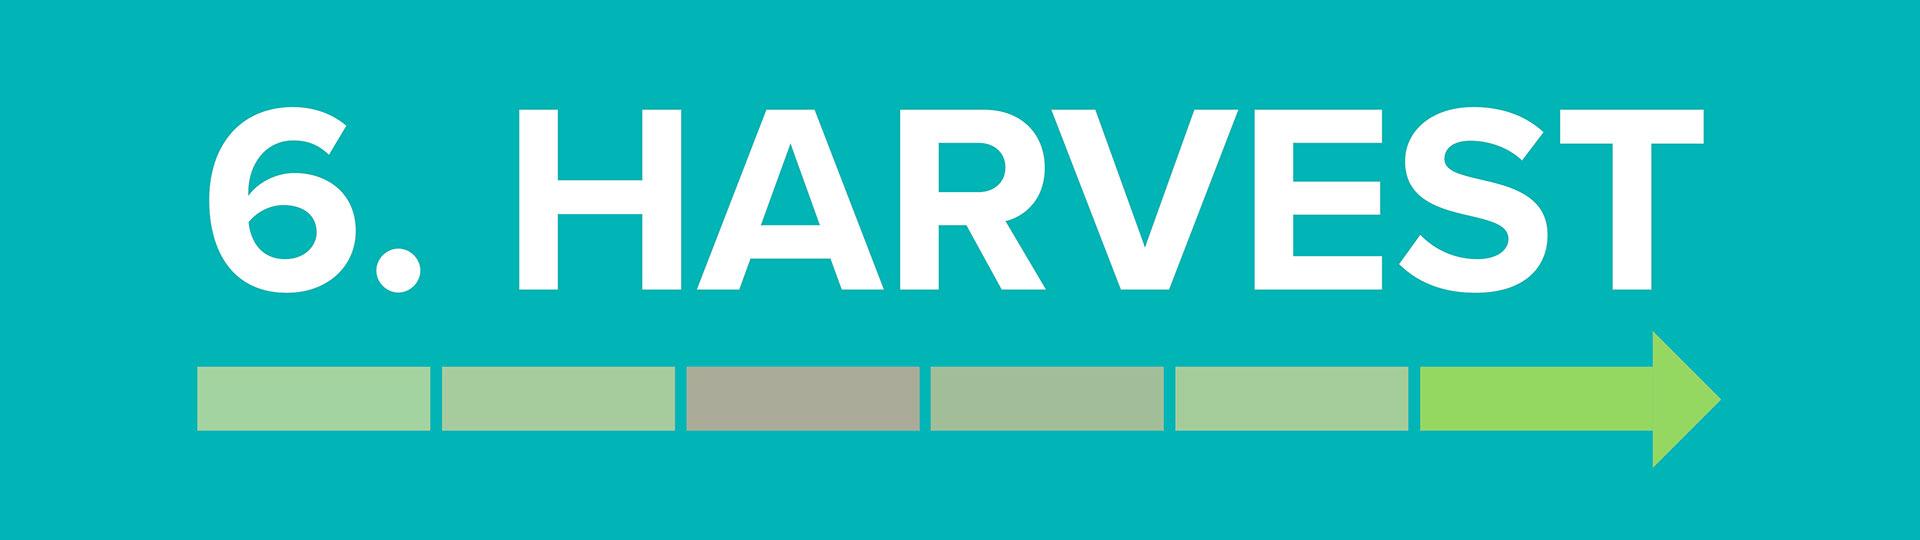 The Startup J Curve Harvest Infographic